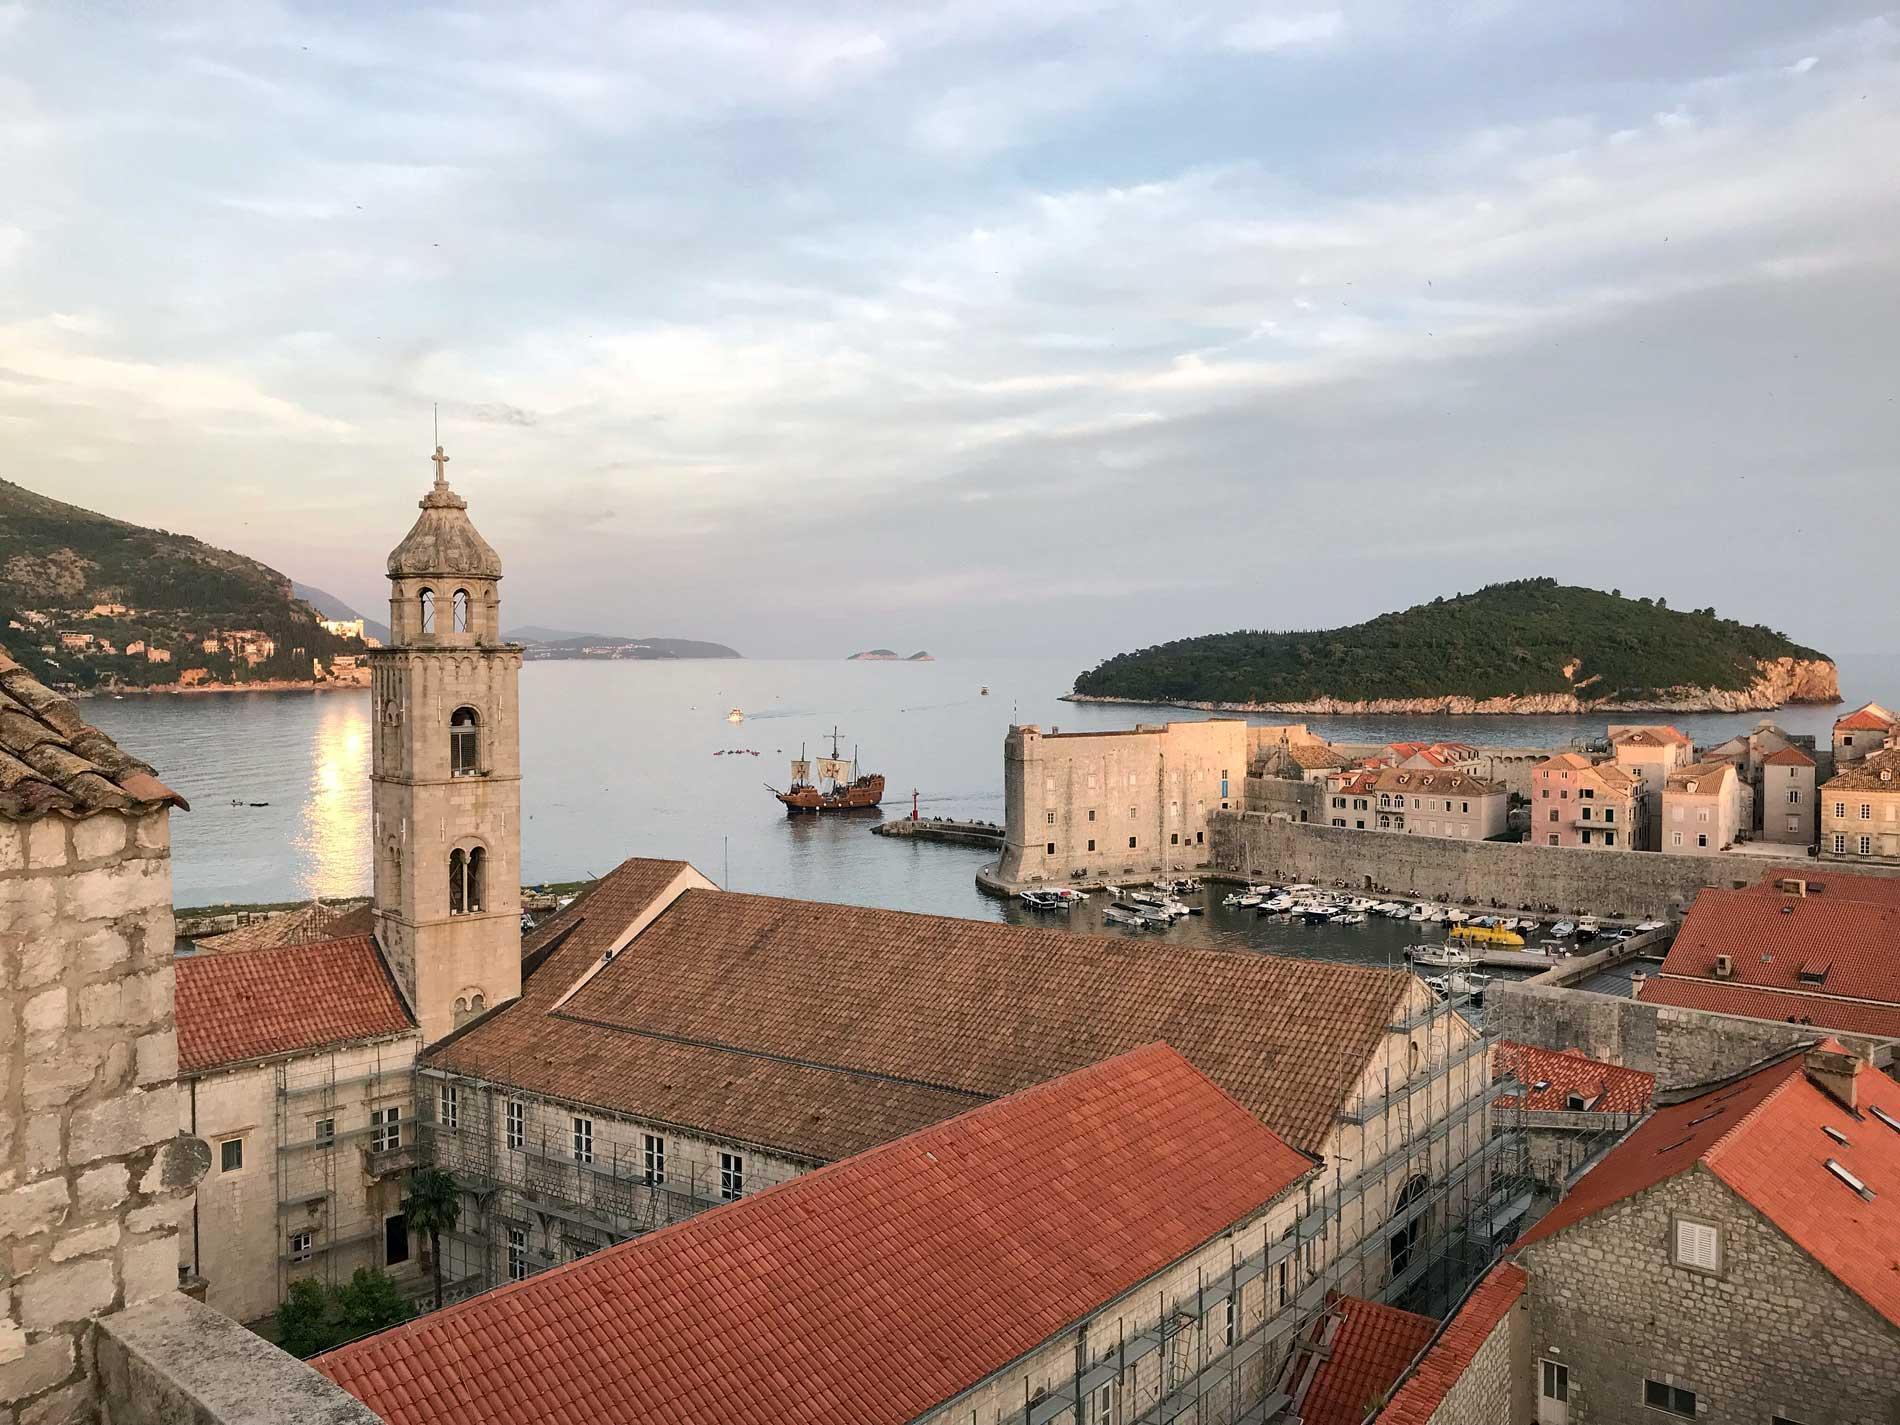 Dubrovnik-Croazia-panorama-dalle-mura-porto-monastero-benedettino-Lokrum